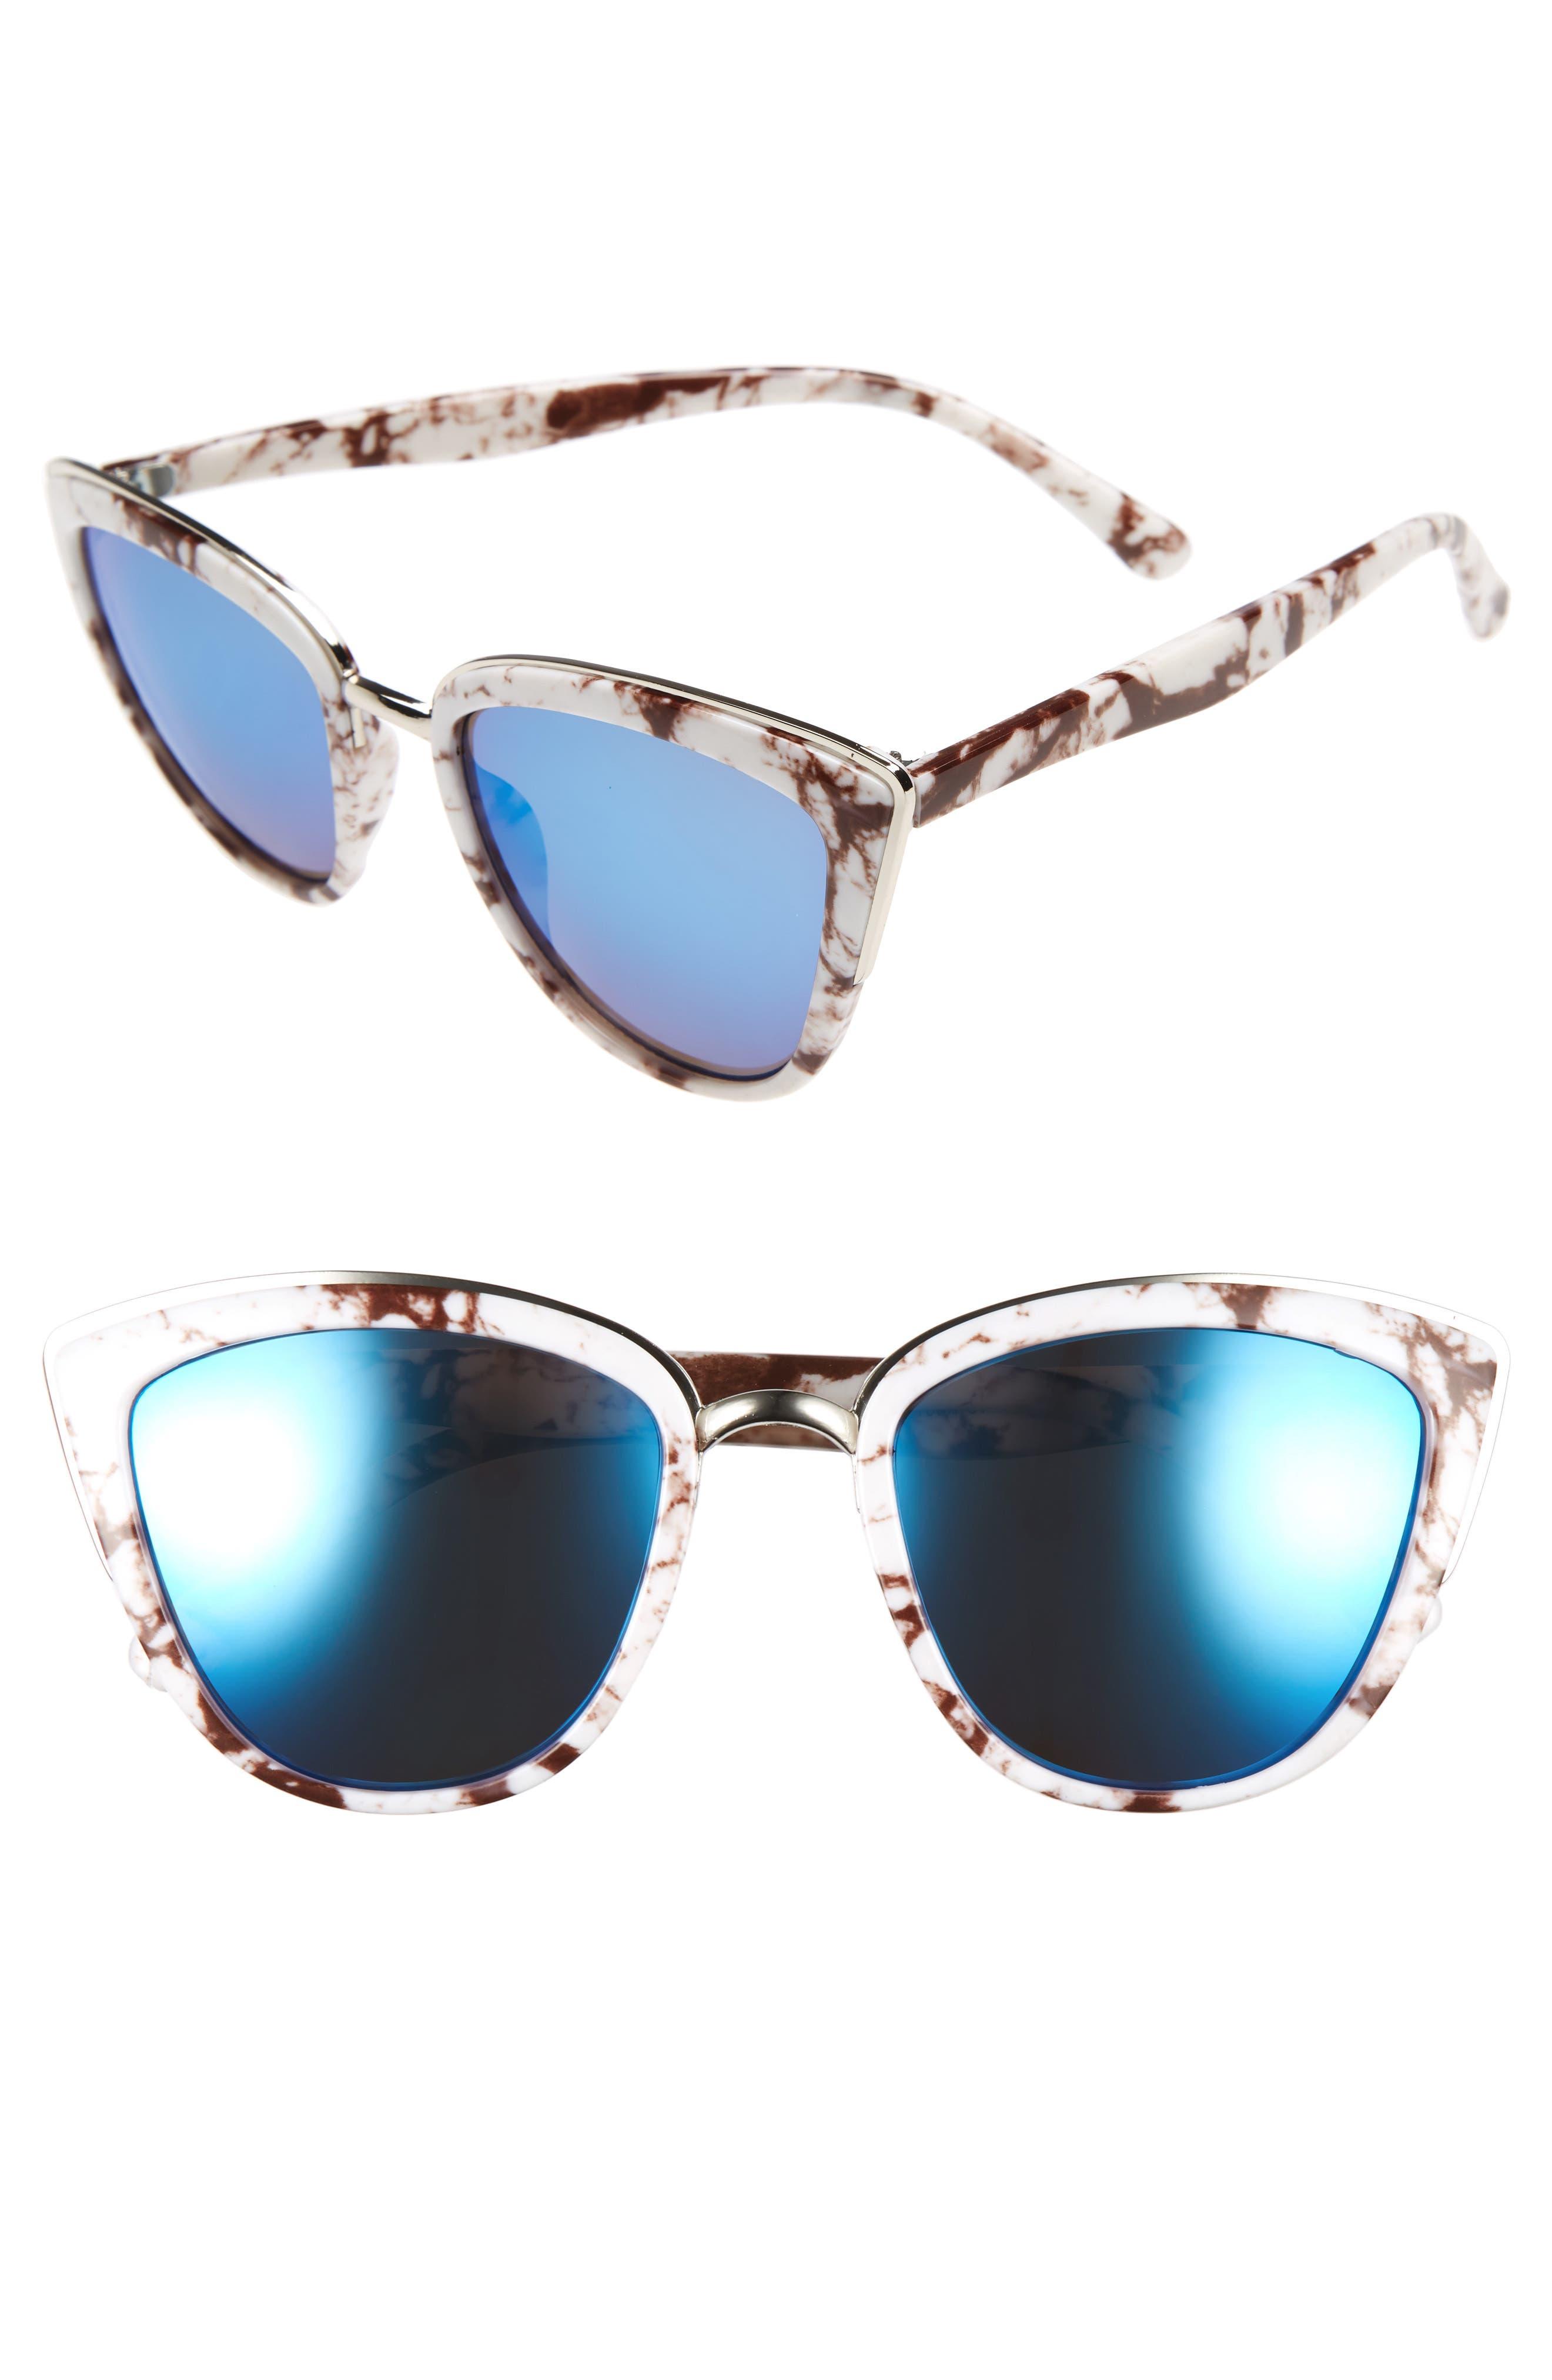 57mm Cat Eye Sunglasses,                             Main thumbnail 1, color,                             100